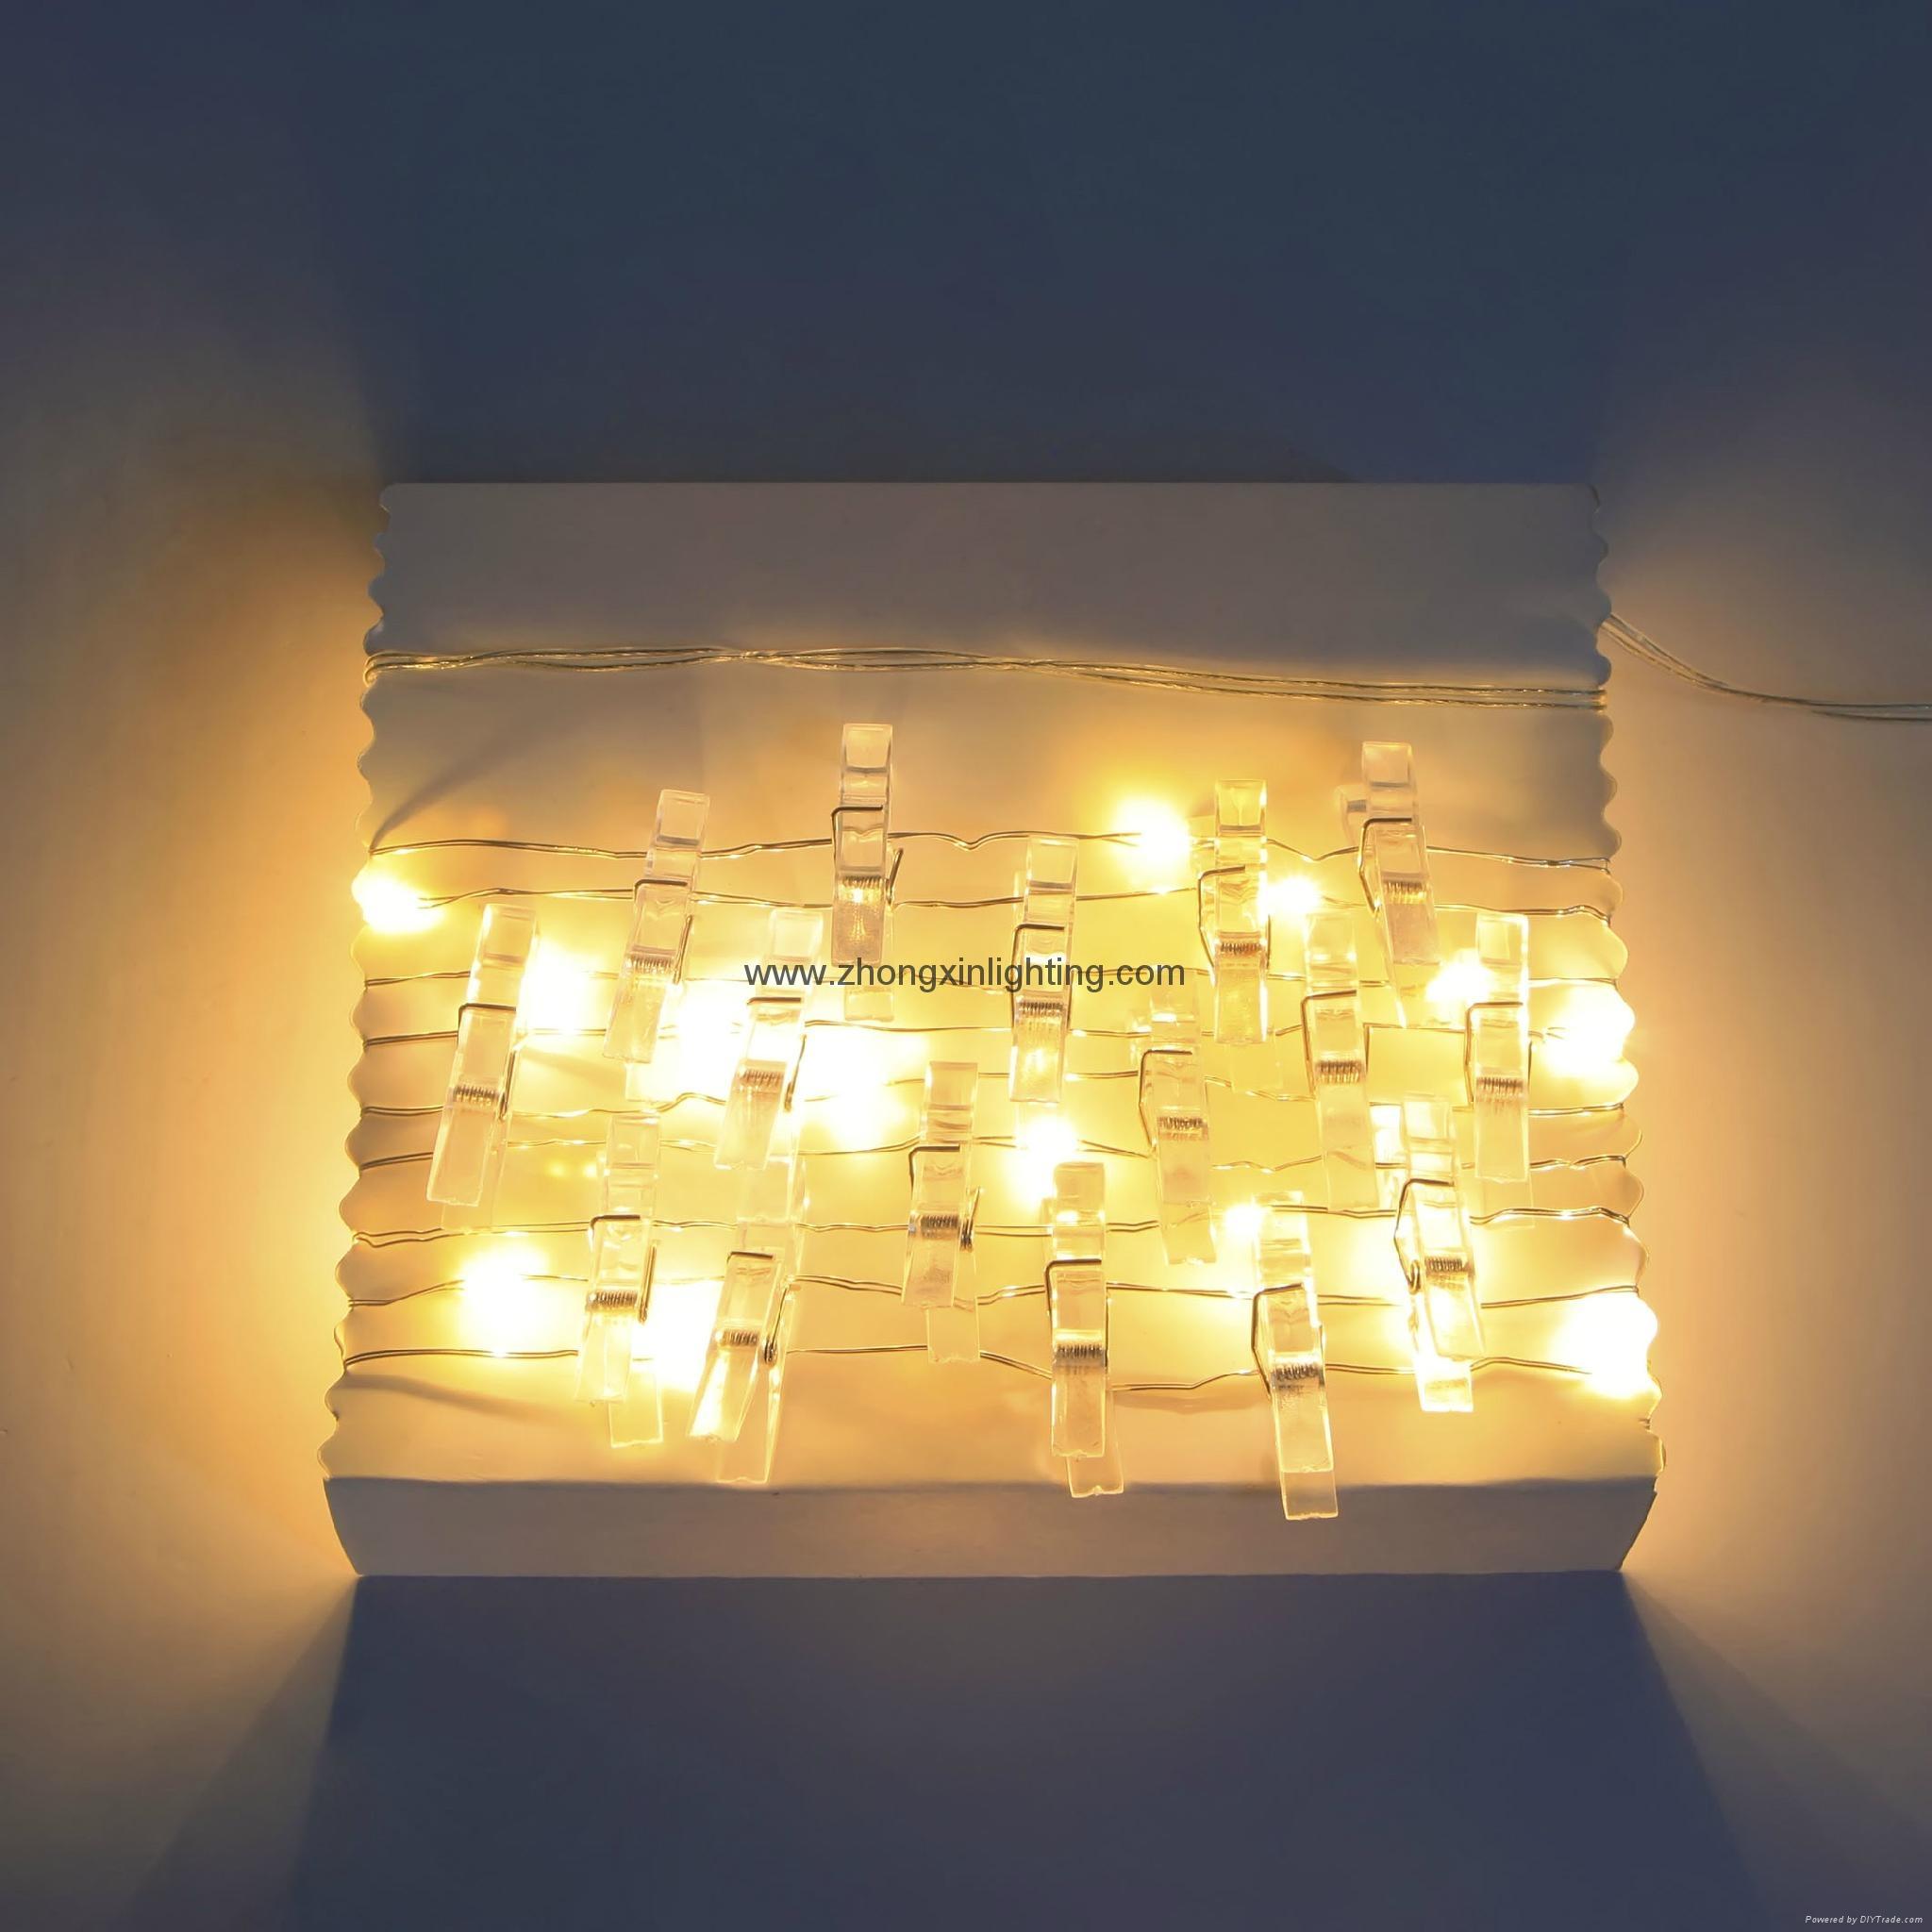 led string light bo 25 smd mini clip string lights kf67218ww lawn and garden international. Black Bedroom Furniture Sets. Home Design Ideas